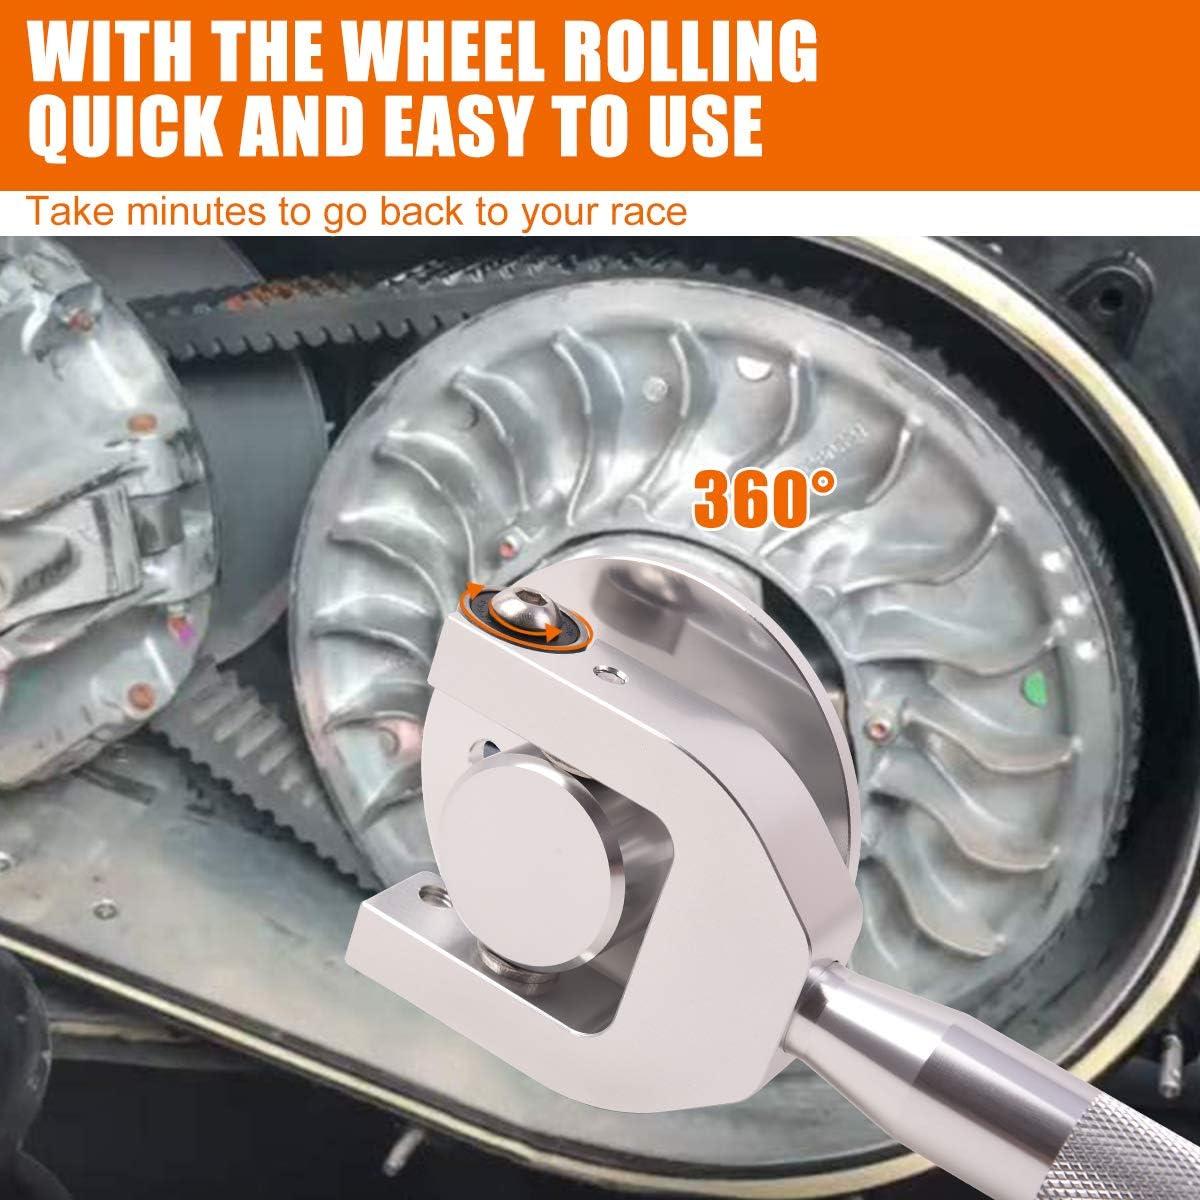 Polaris RZR Belt Changing Tool for Polaris RZR XP Turbo//S 2016-2019 Polaris RZR RS1 2018 and 2019 Models